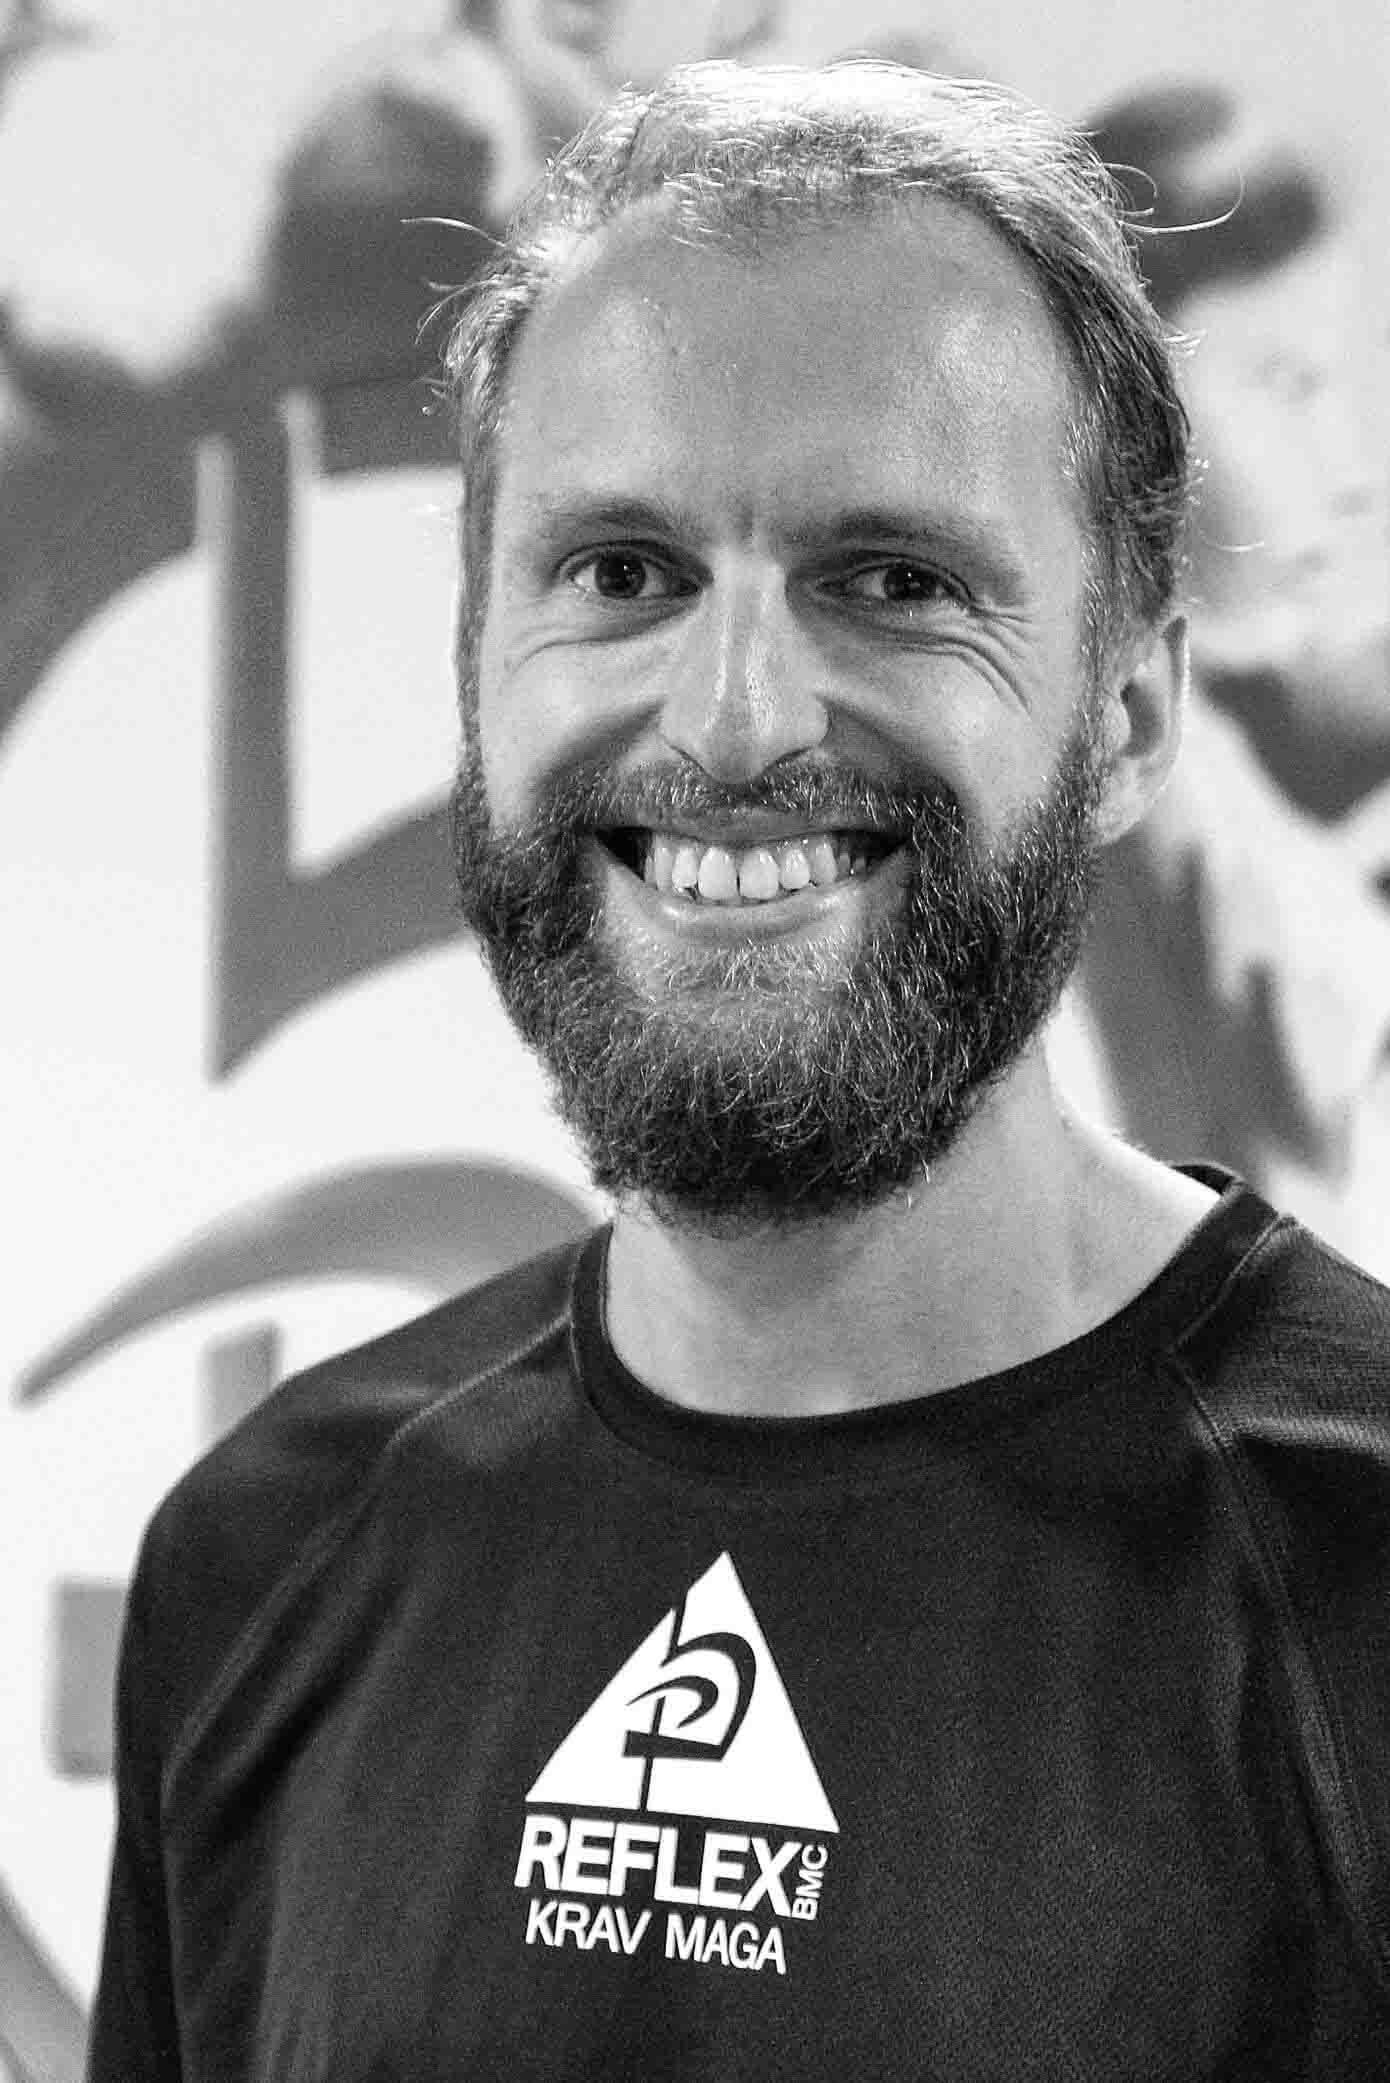 Jonathan Trainer Reflex Utrecht.jpg